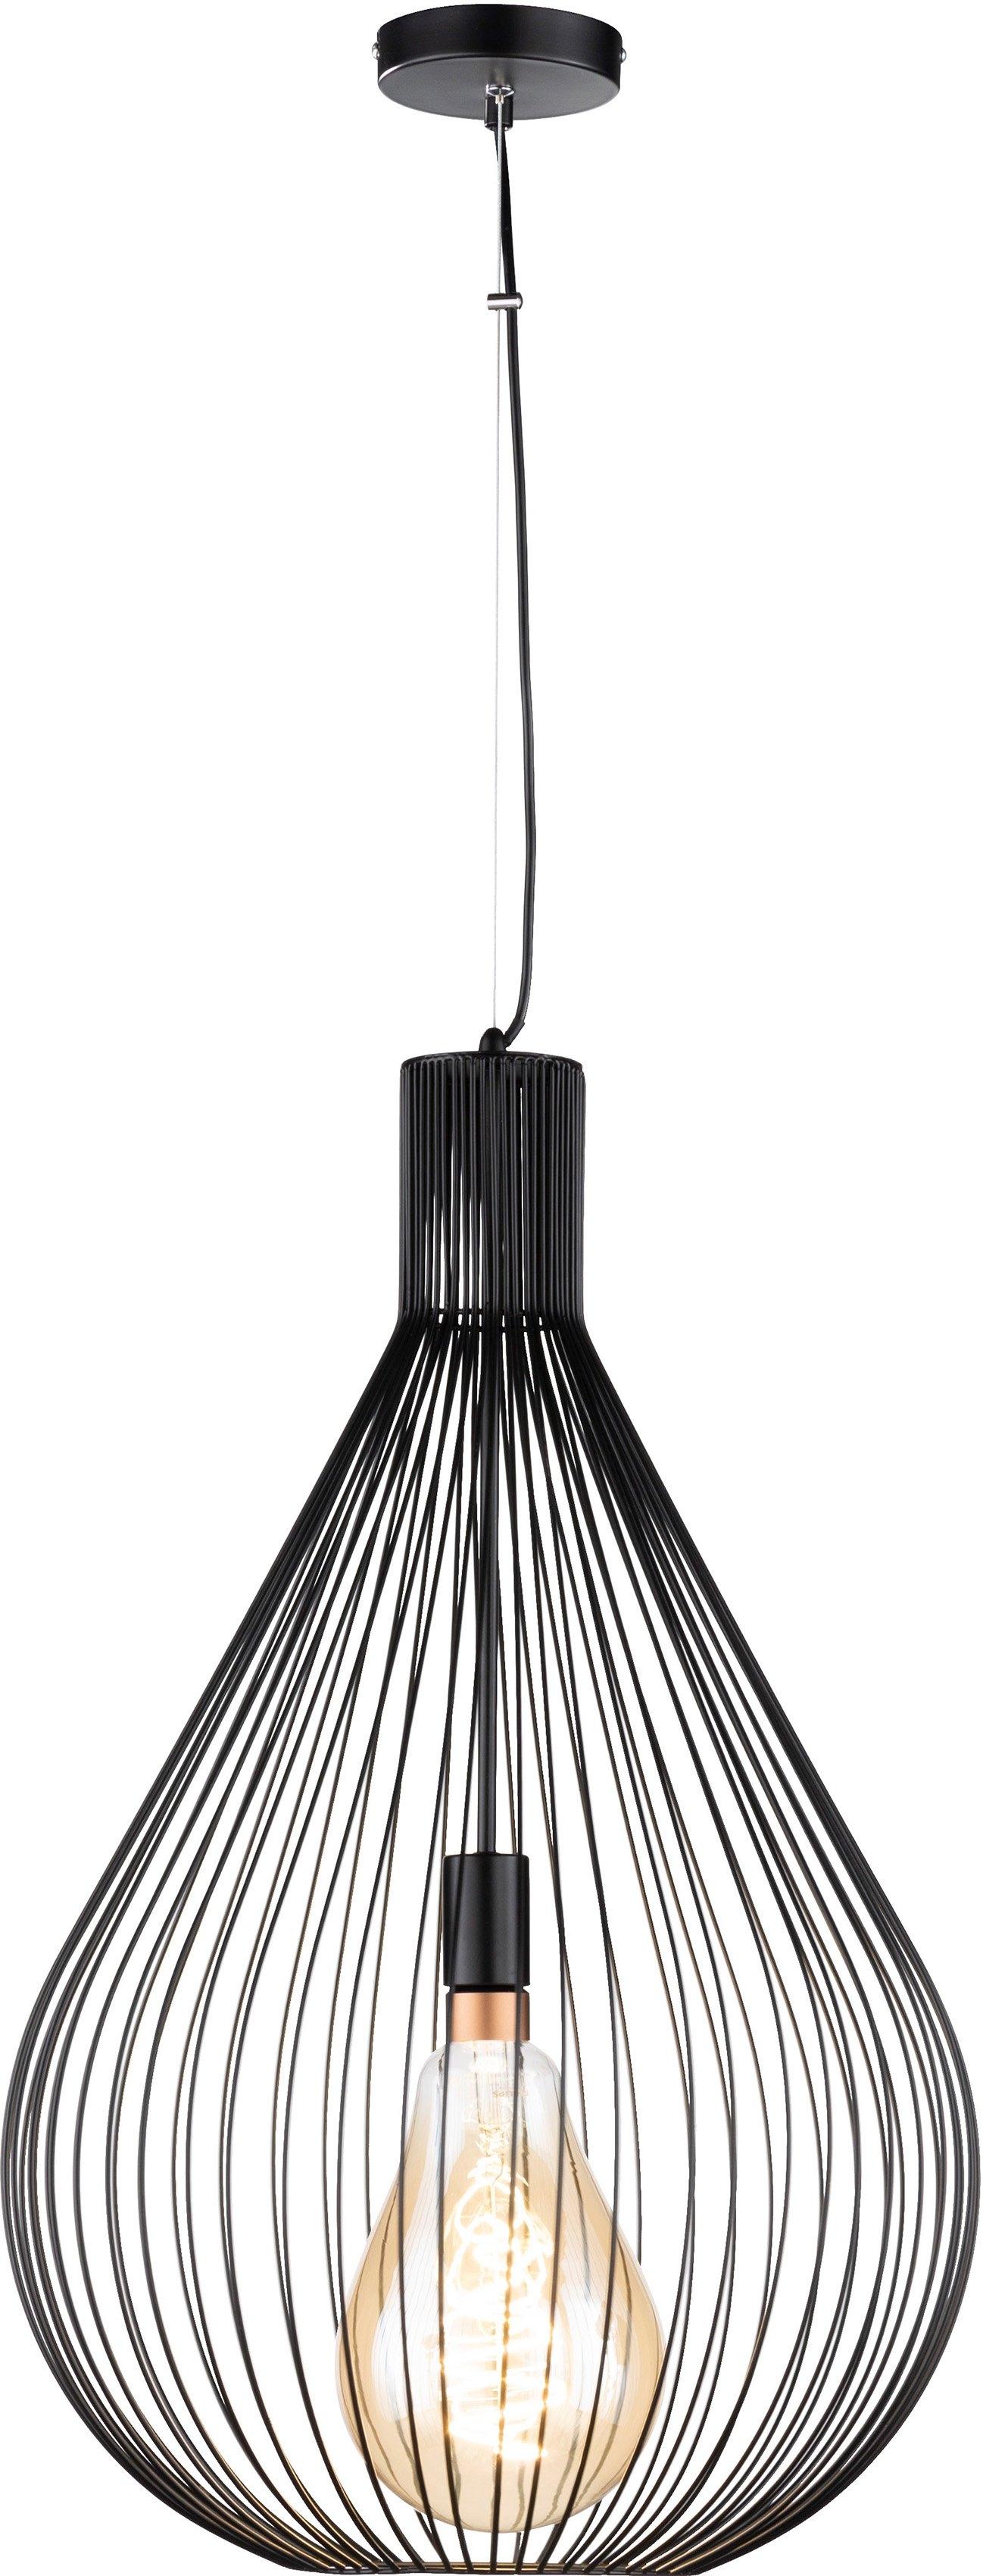 Honsel Leuchten hanglamp Benett - gratis ruilen op otto.nl